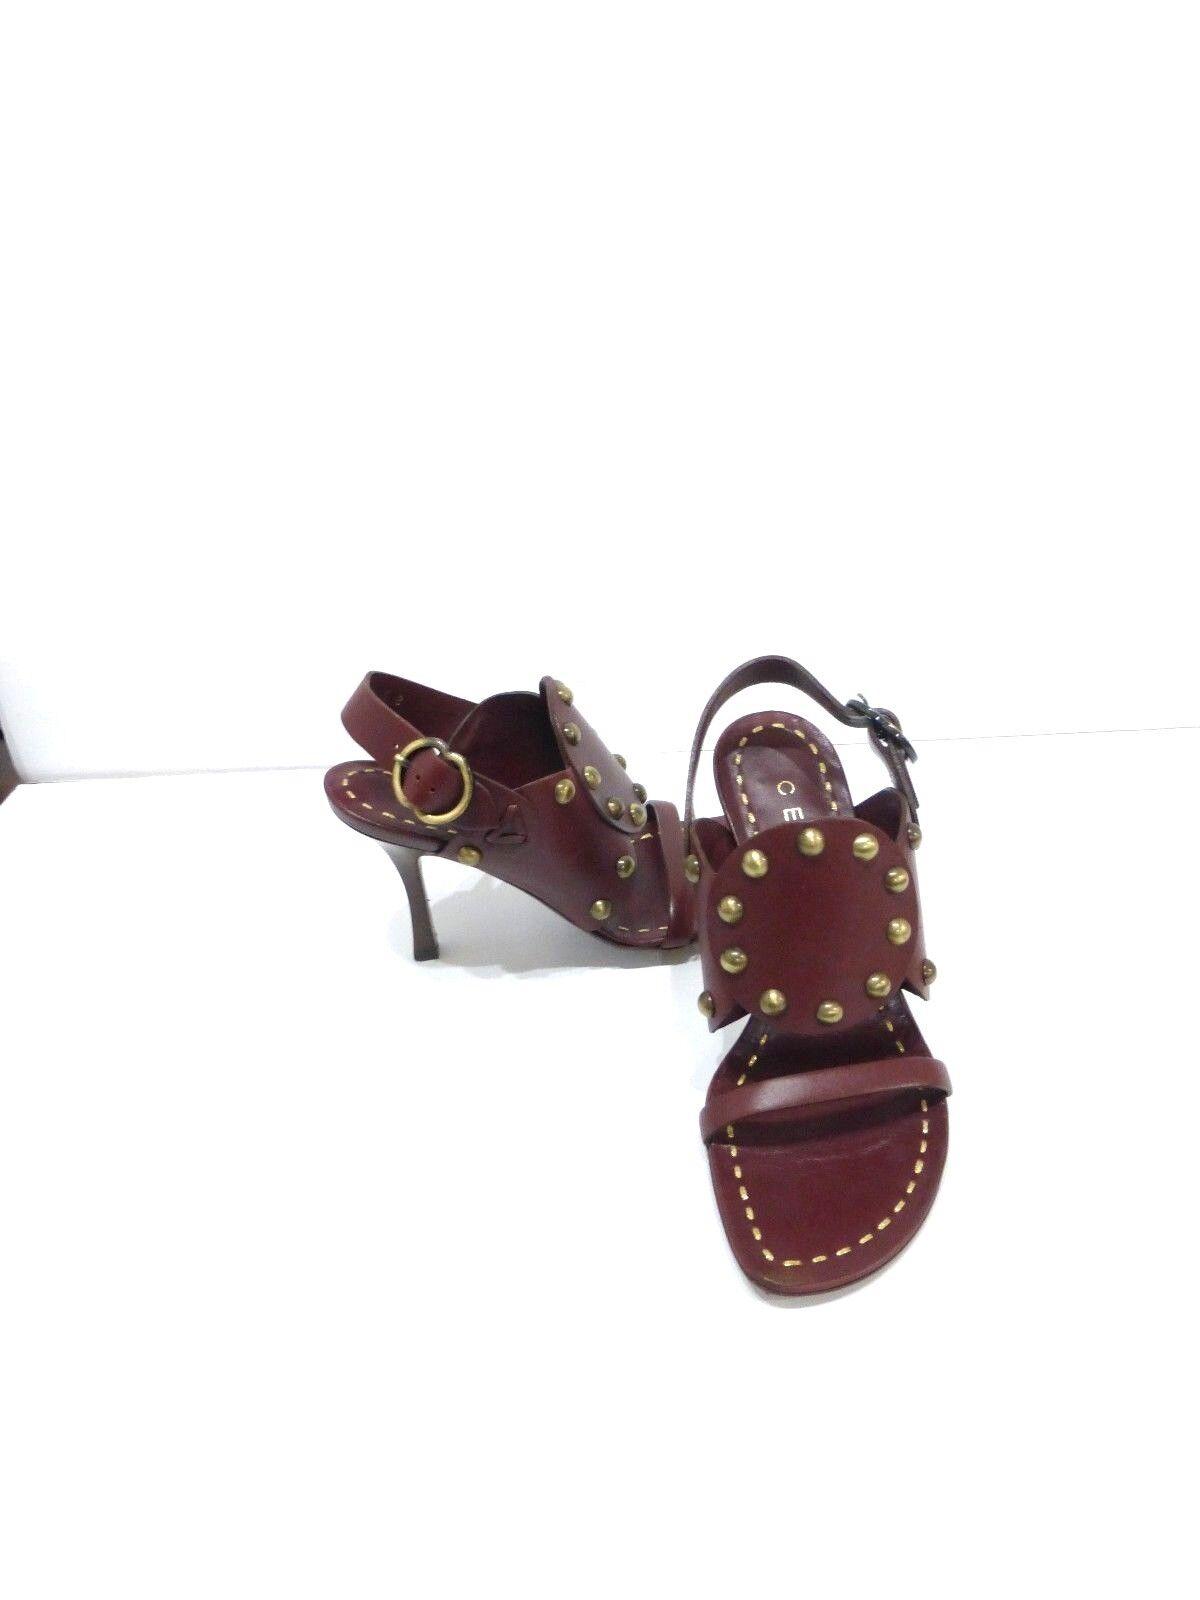 Celine braun Leather Sandals w Stud Detail Detail Detail sz 5 Euro 35 7e99cf